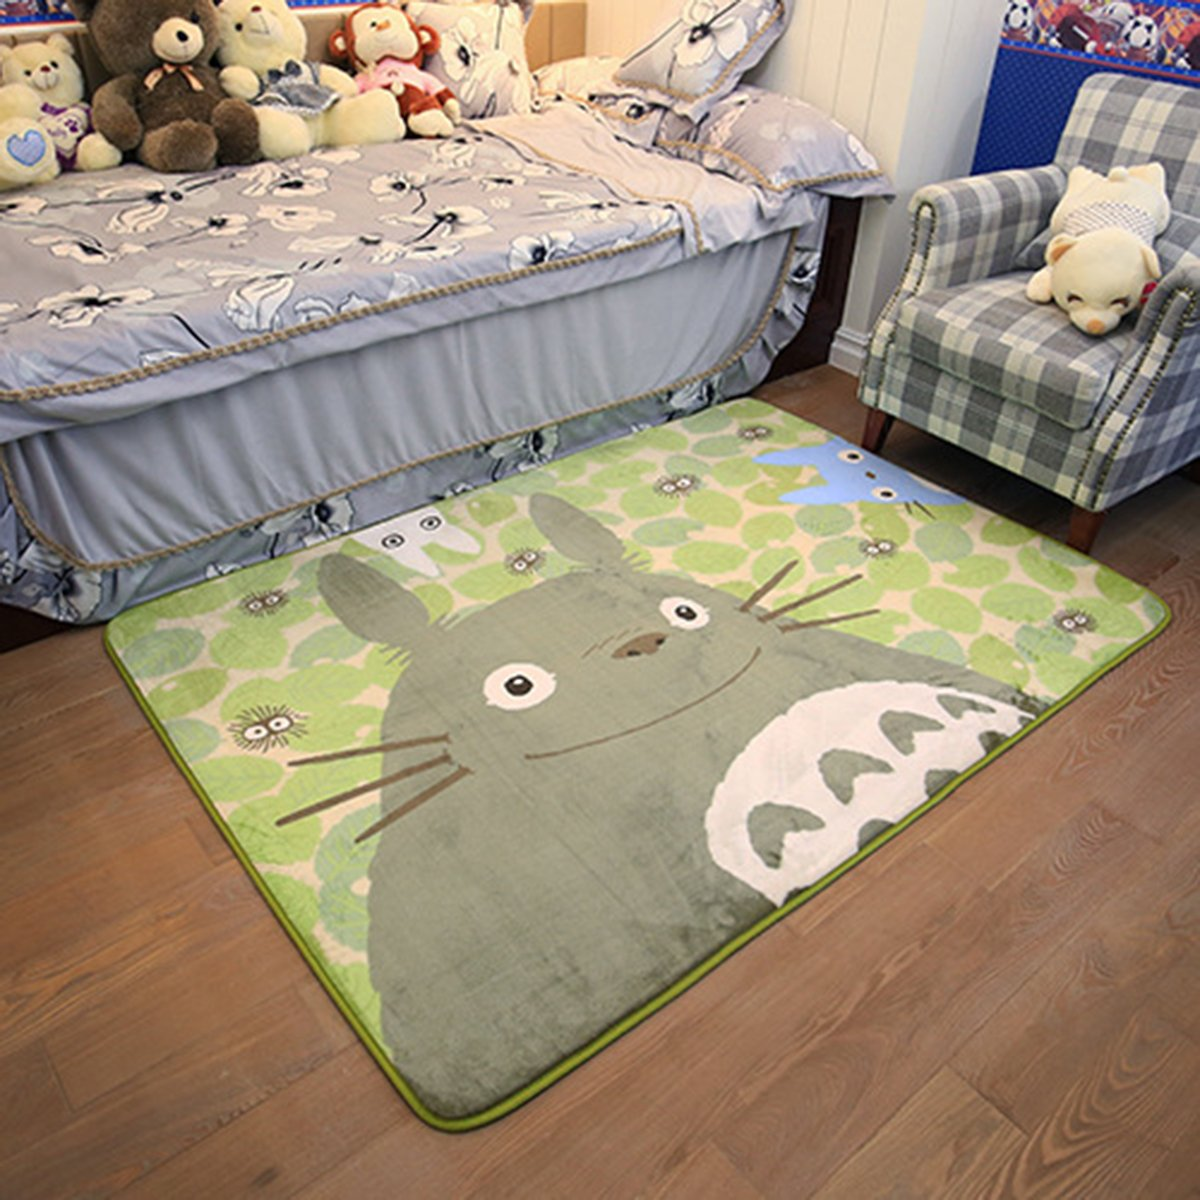 EKEA-Home Cartoon TOTORO Skid-proof Washable Big Carpet Kids Nursery Entertainment Floor Area Rugs Baby Crawling Mat For Living Room/Bed Room Green,50x120cm/19.7''x47.28''